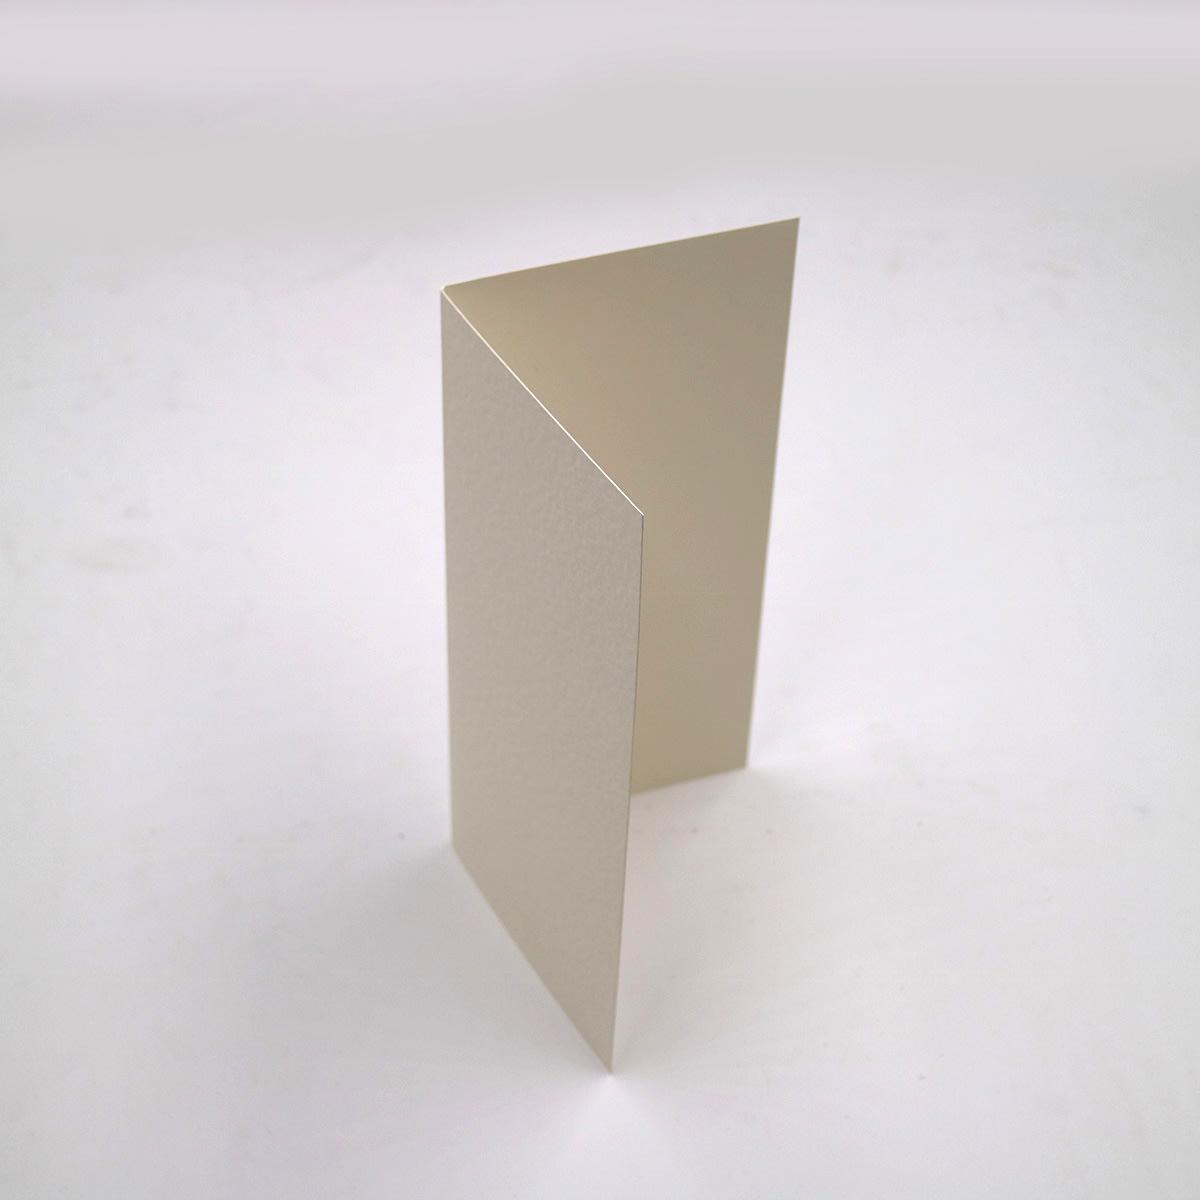 A5 IVORY FINE LINEN SINGLE FOLD CARD BLANKS 300GSM